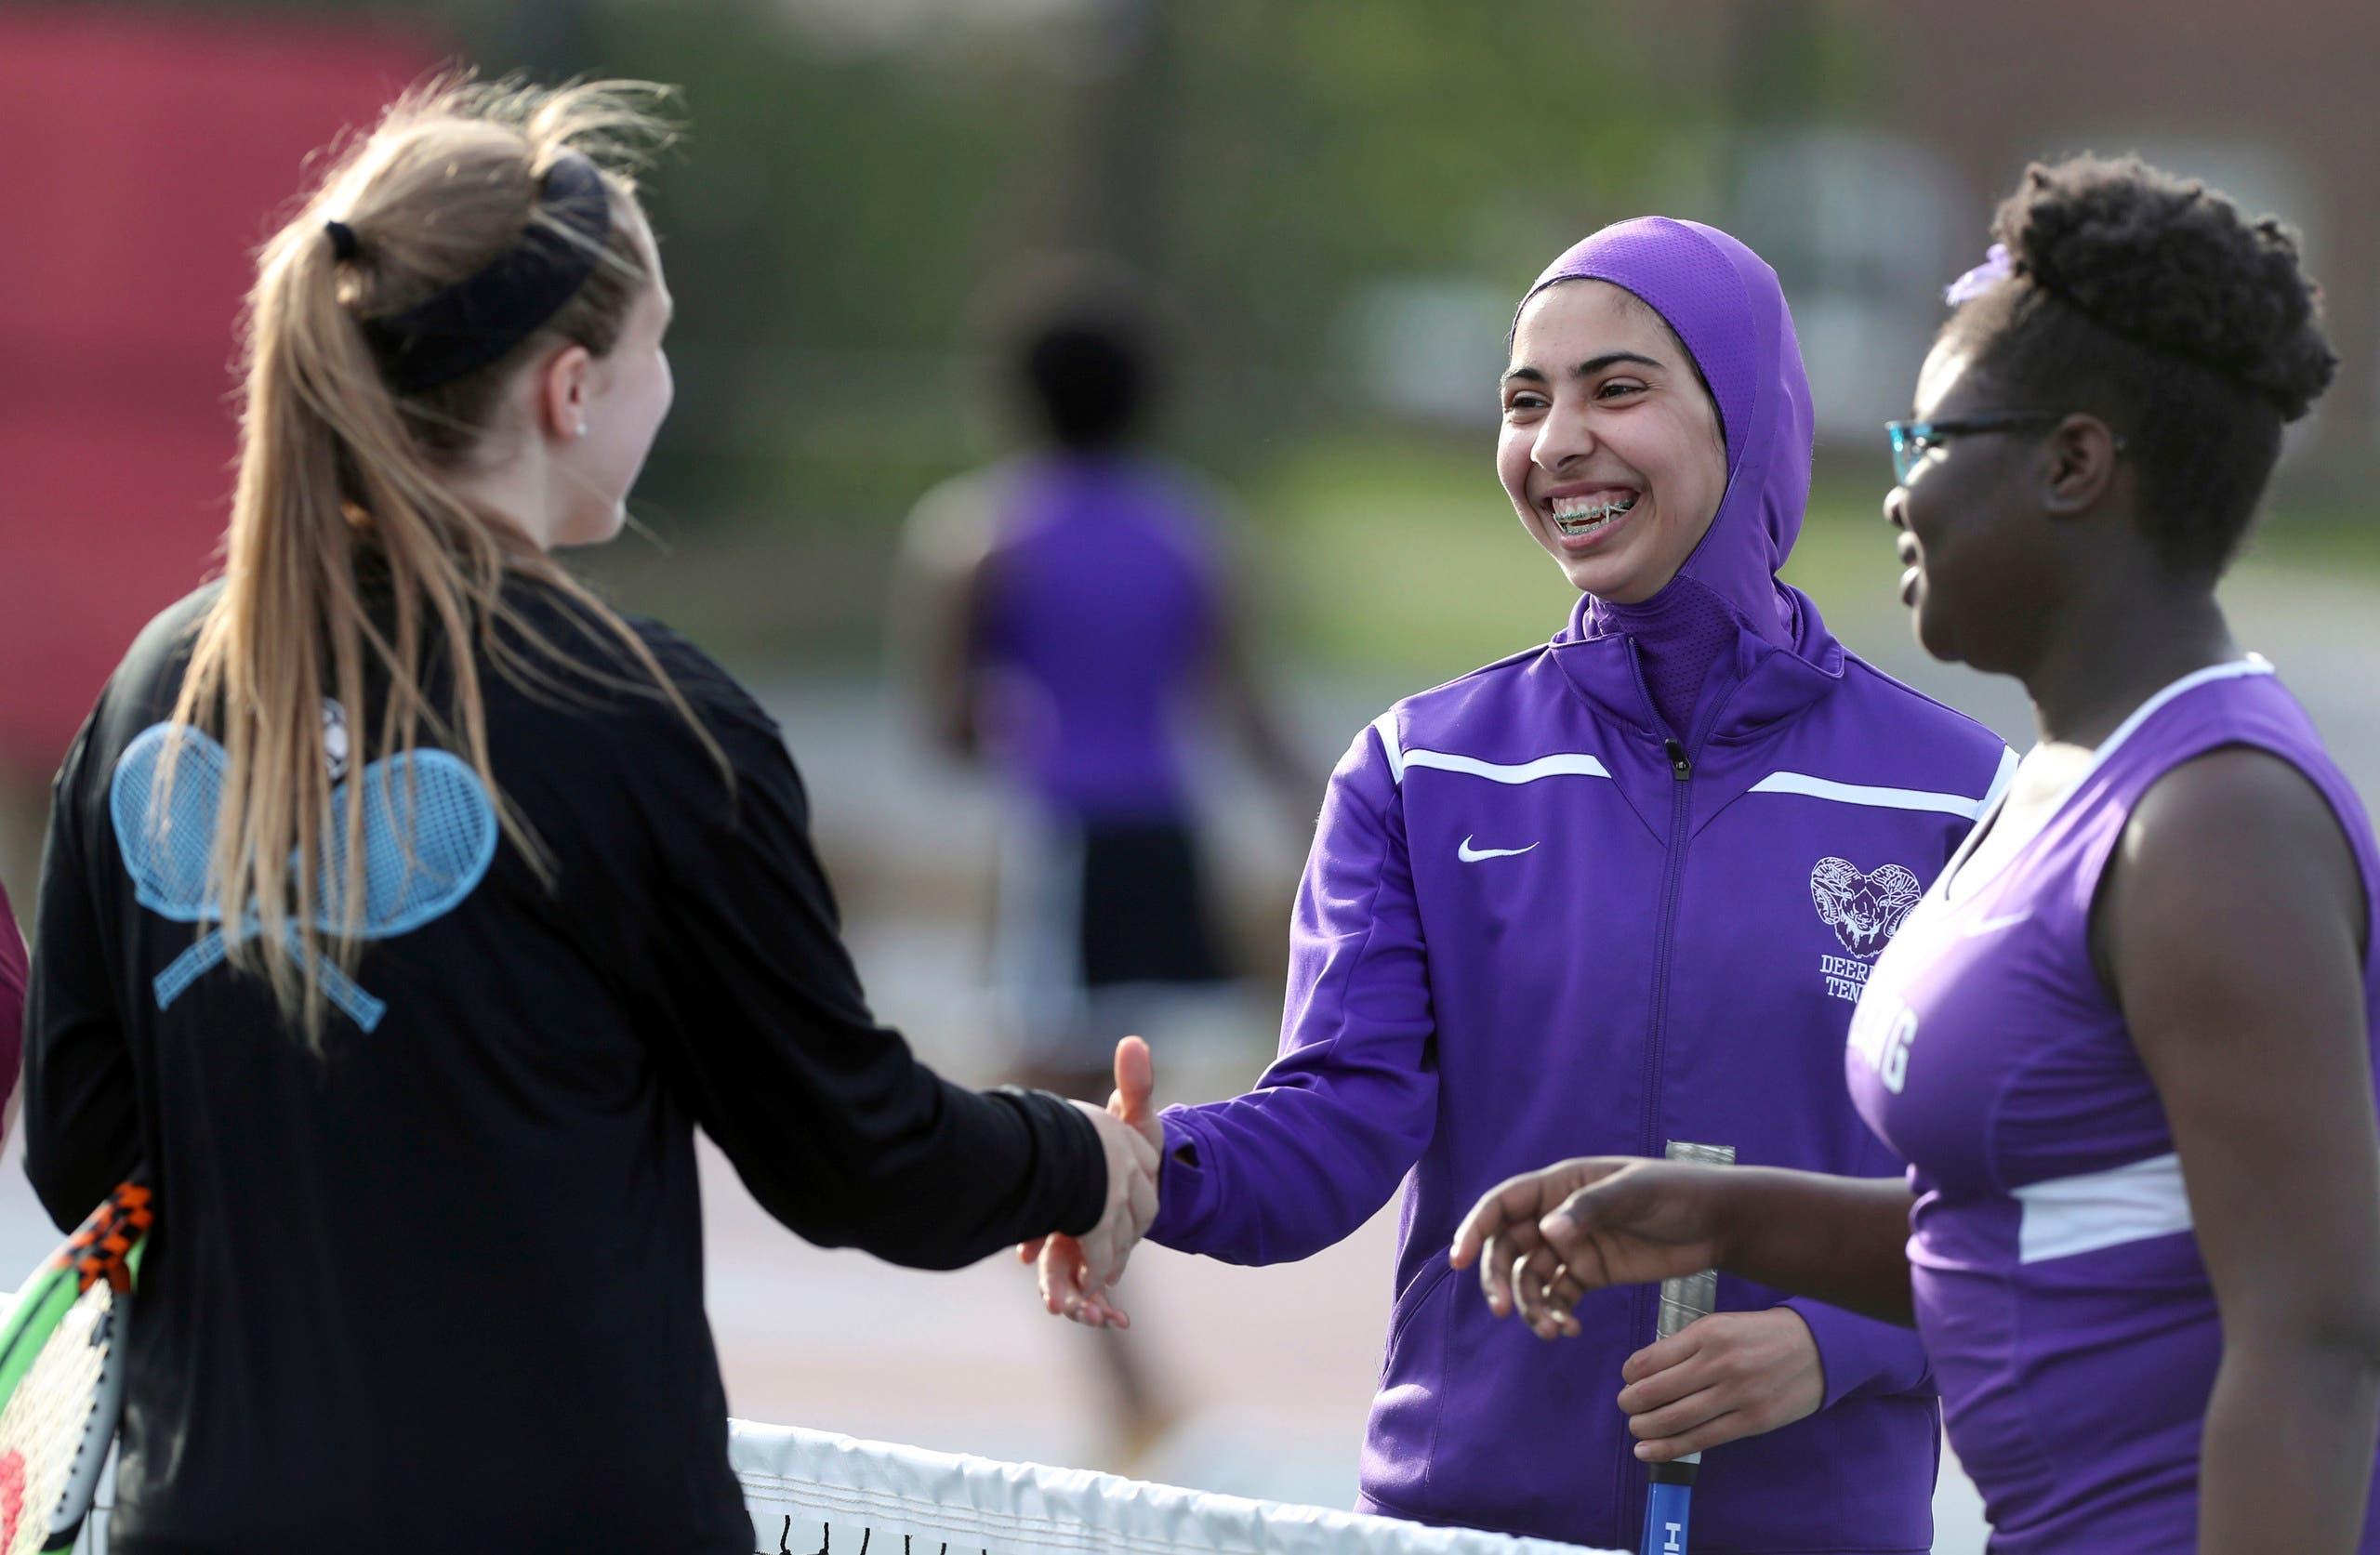 Sporty Hijabs 2